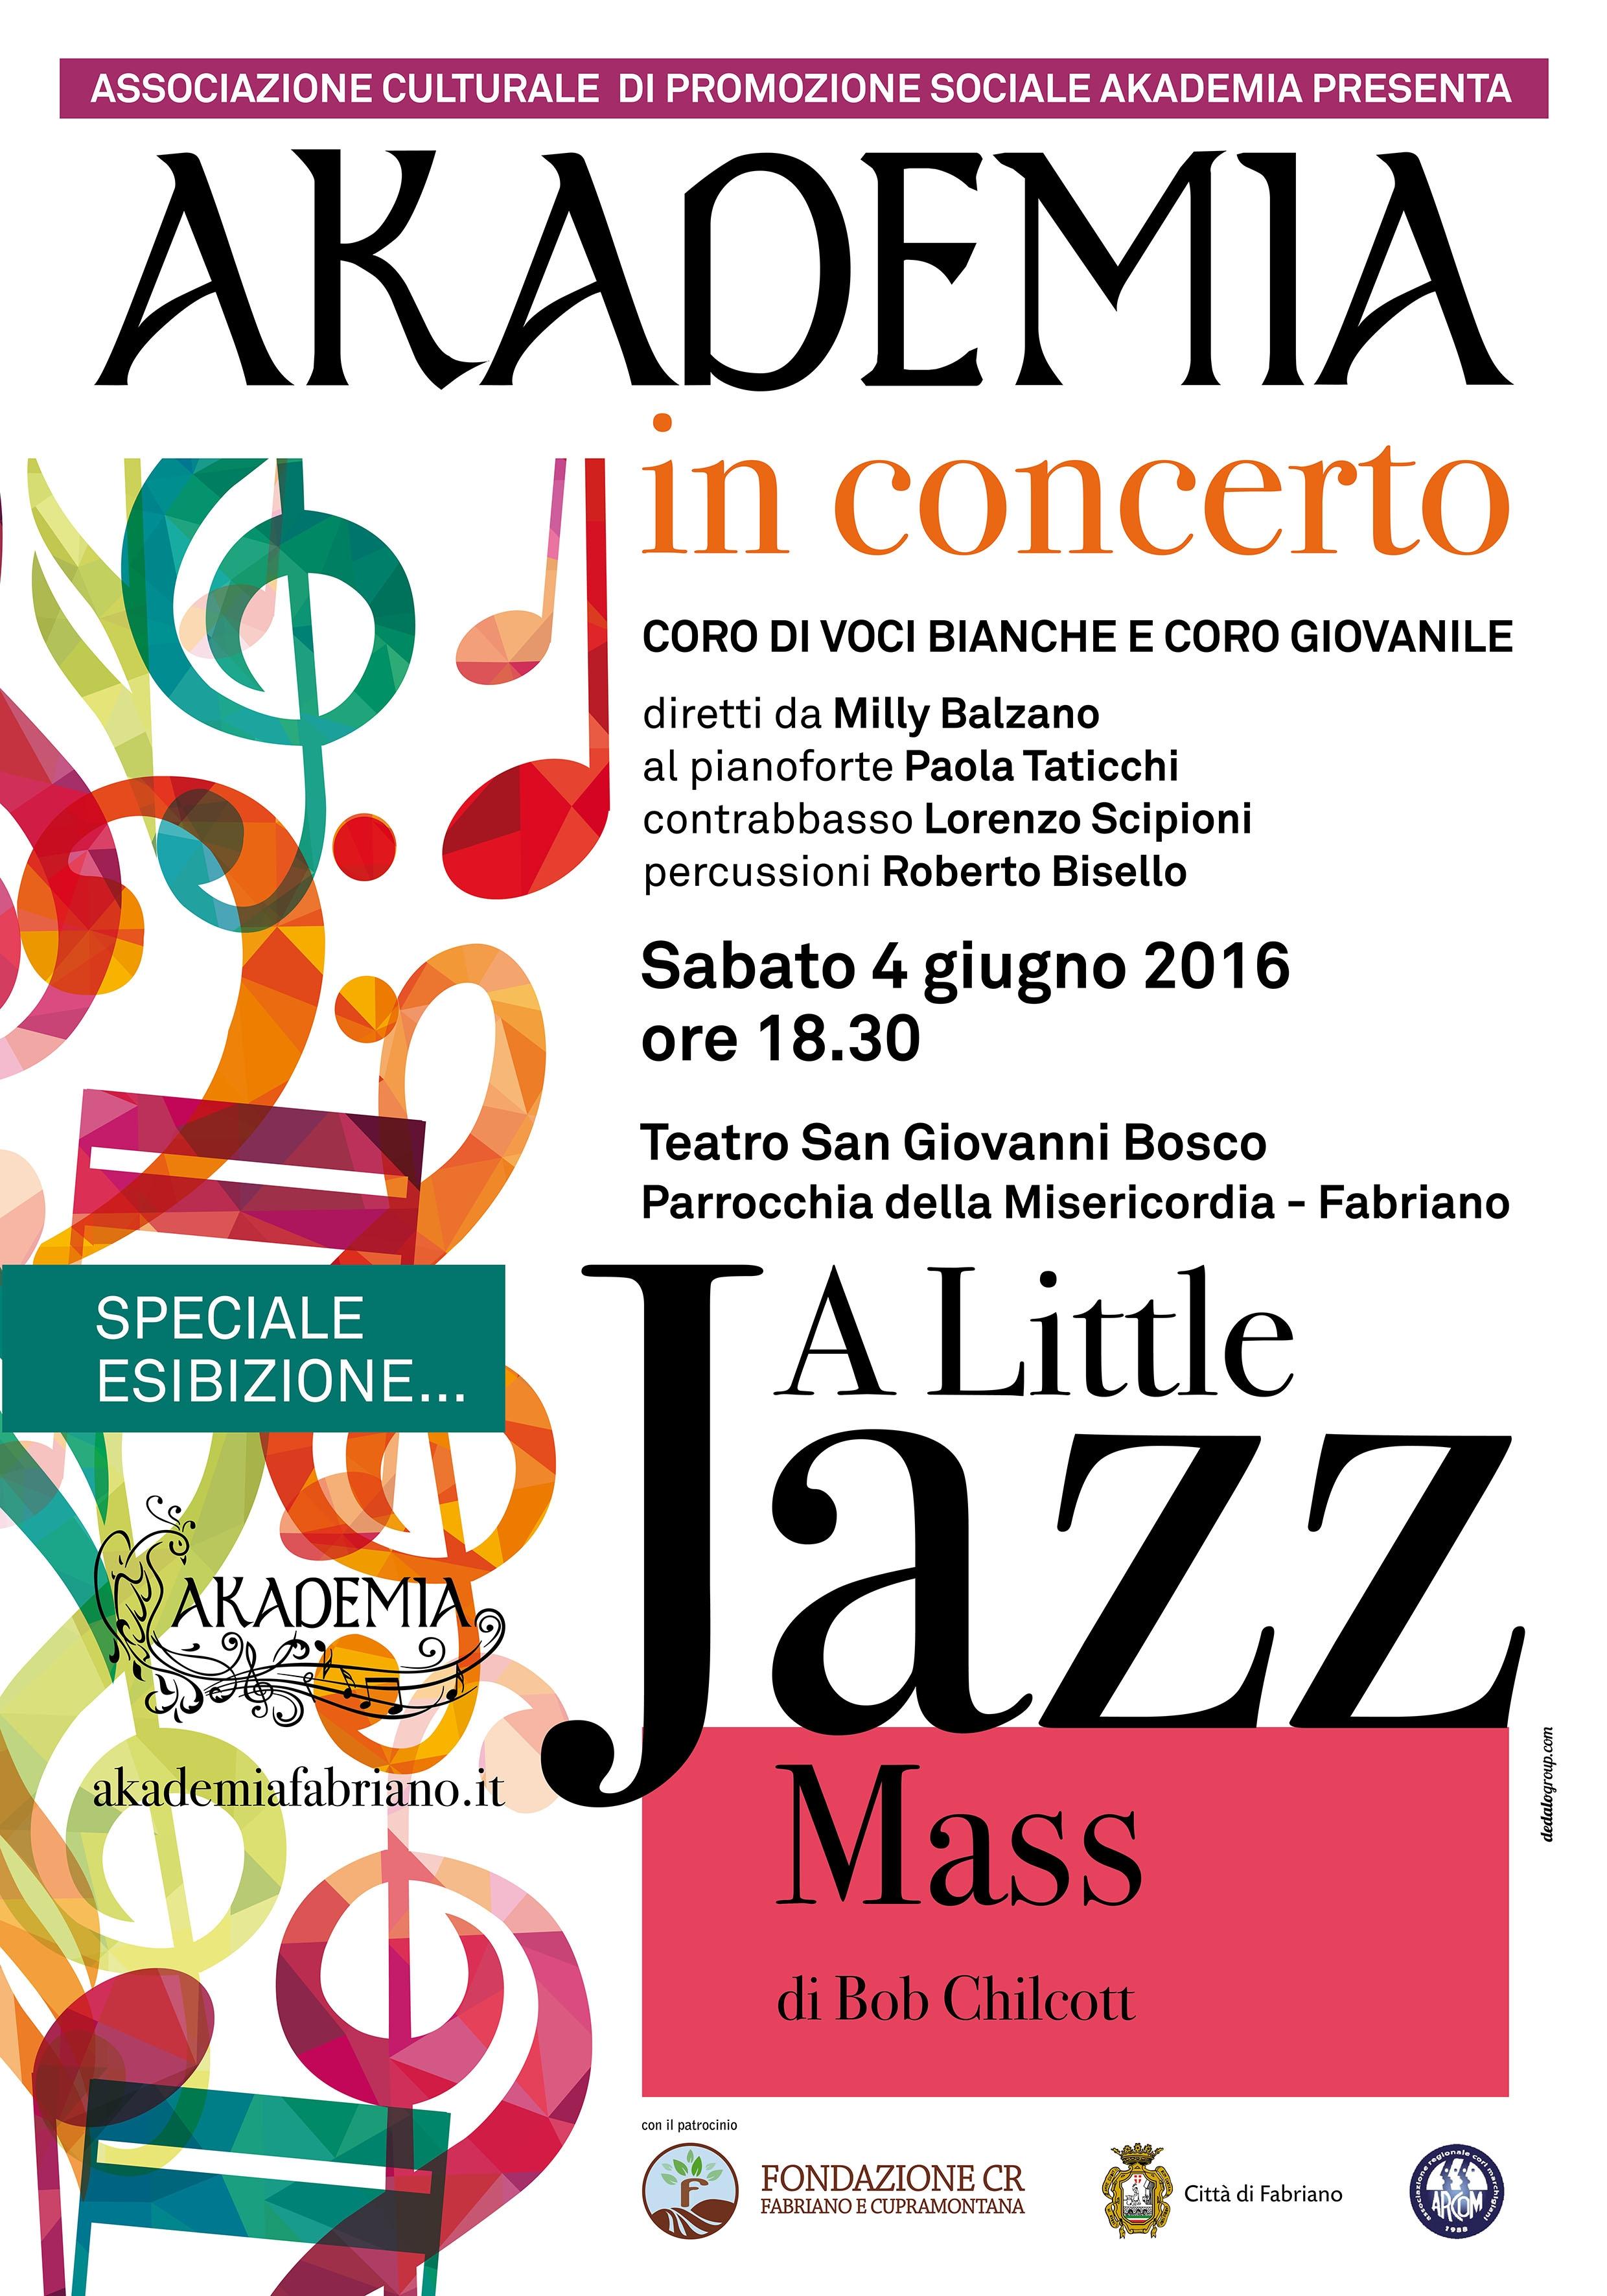 concerto akademia (1)